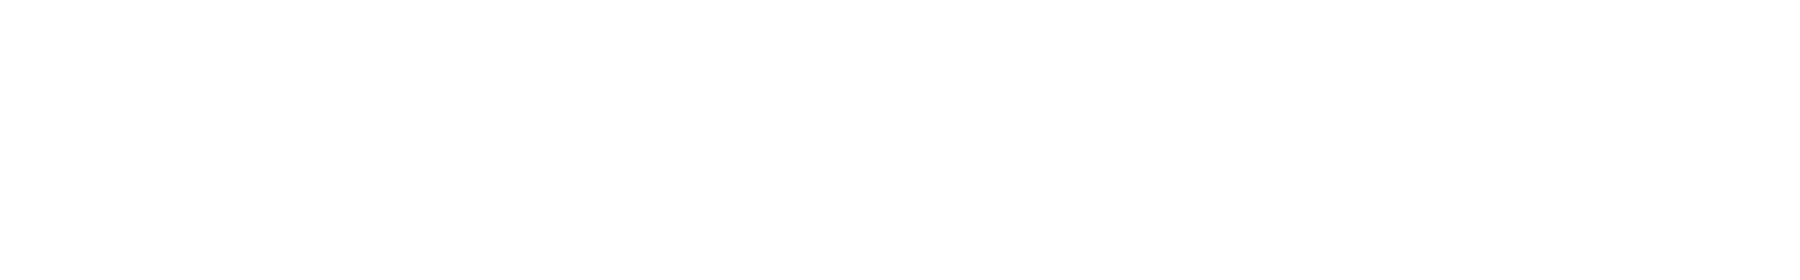 blbc cinedrumsb 110 01